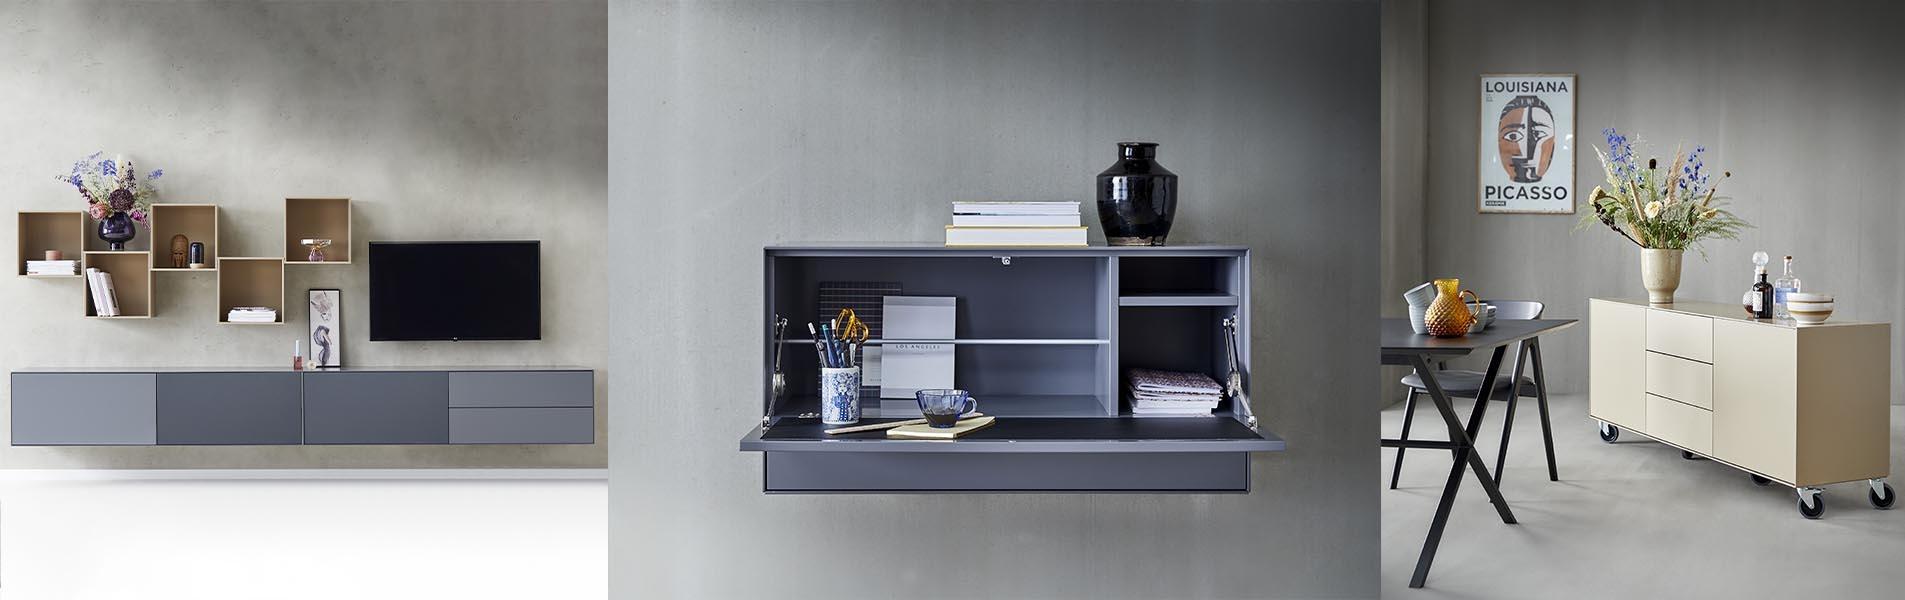 Hammel Furniture - Design danois style scandinave